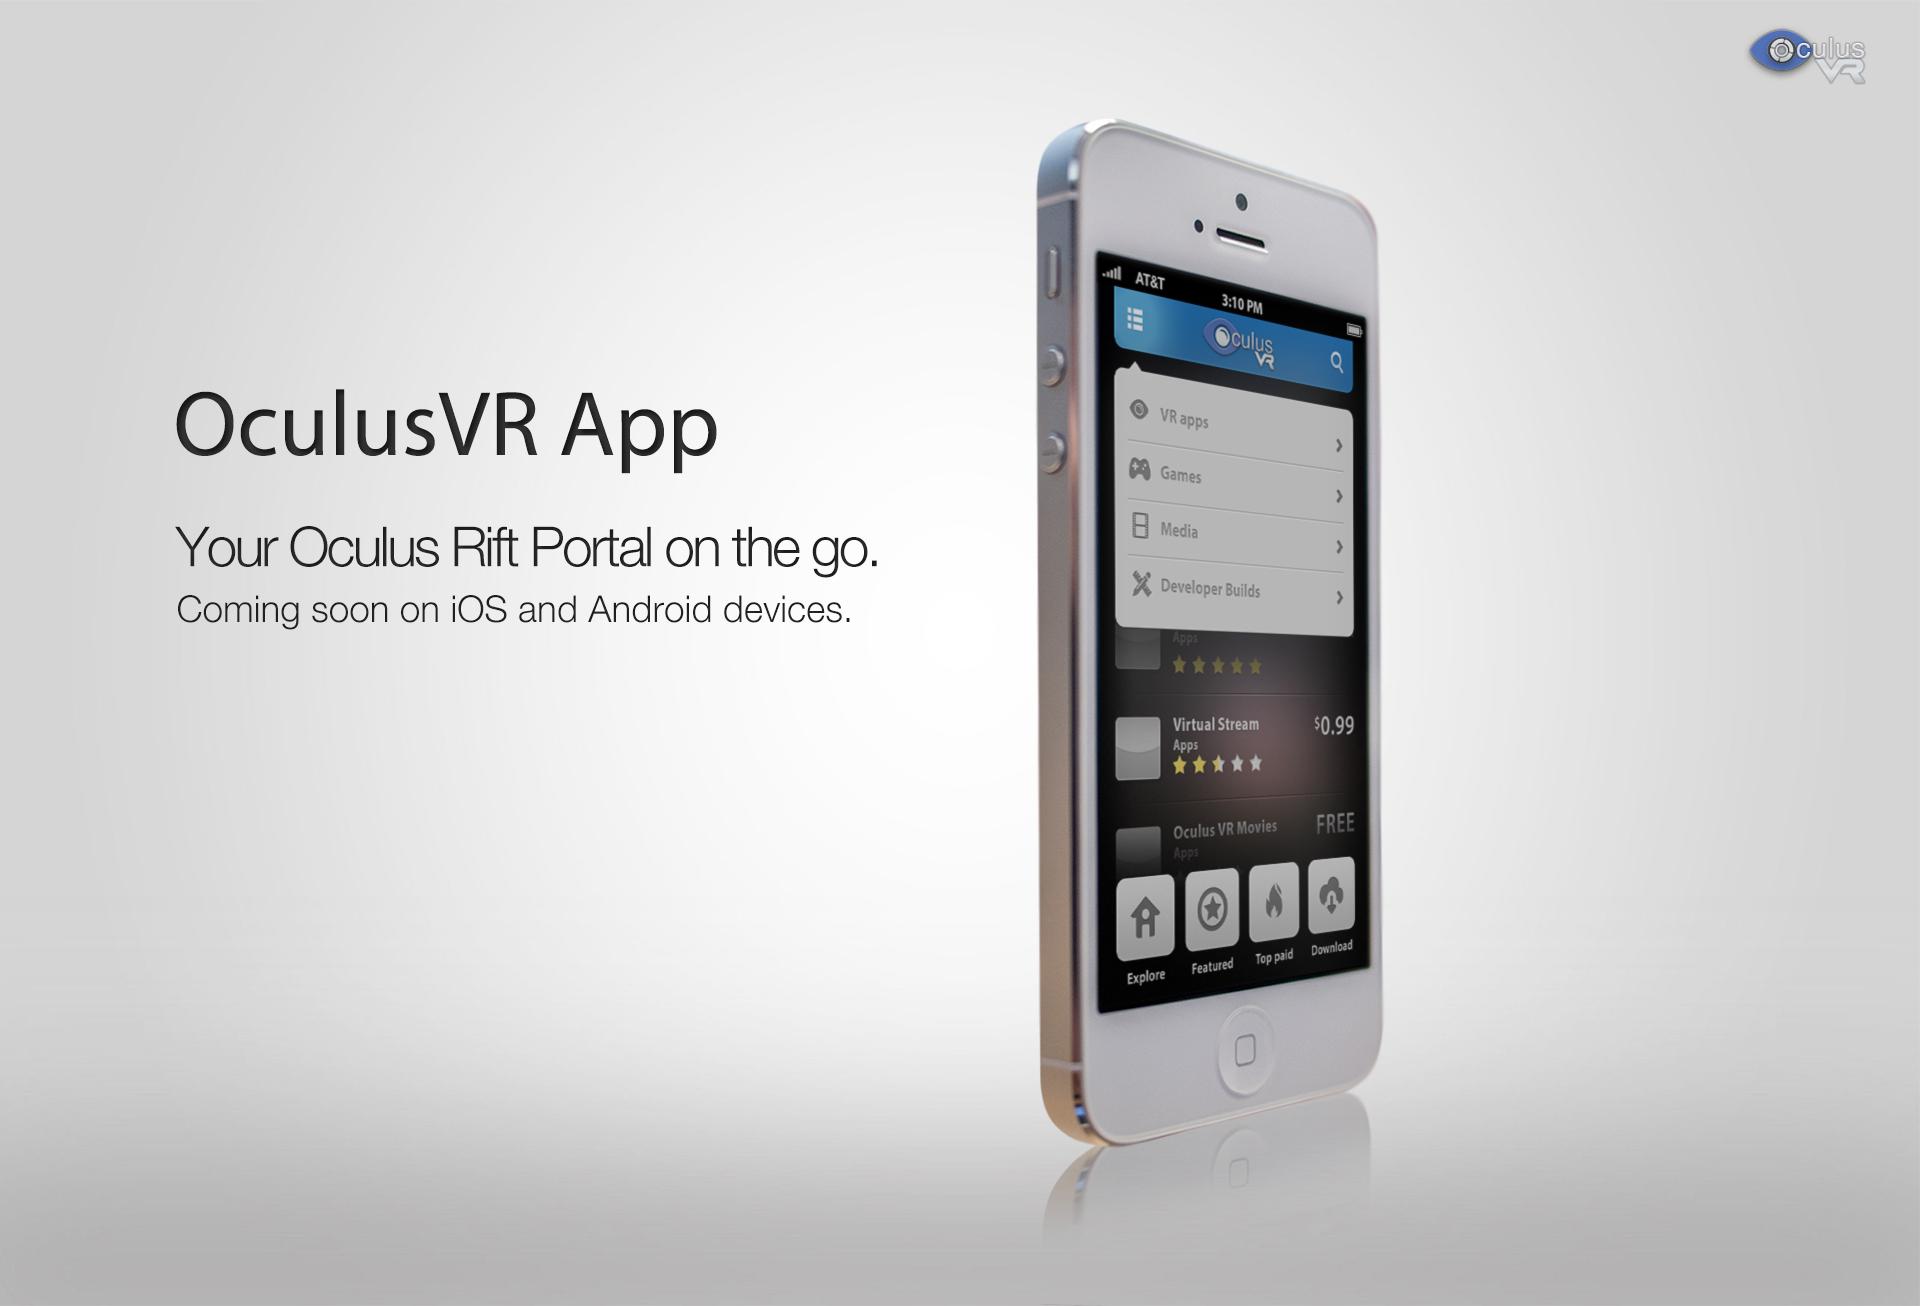 iphone_OculusVR_Store_mockup.jpg